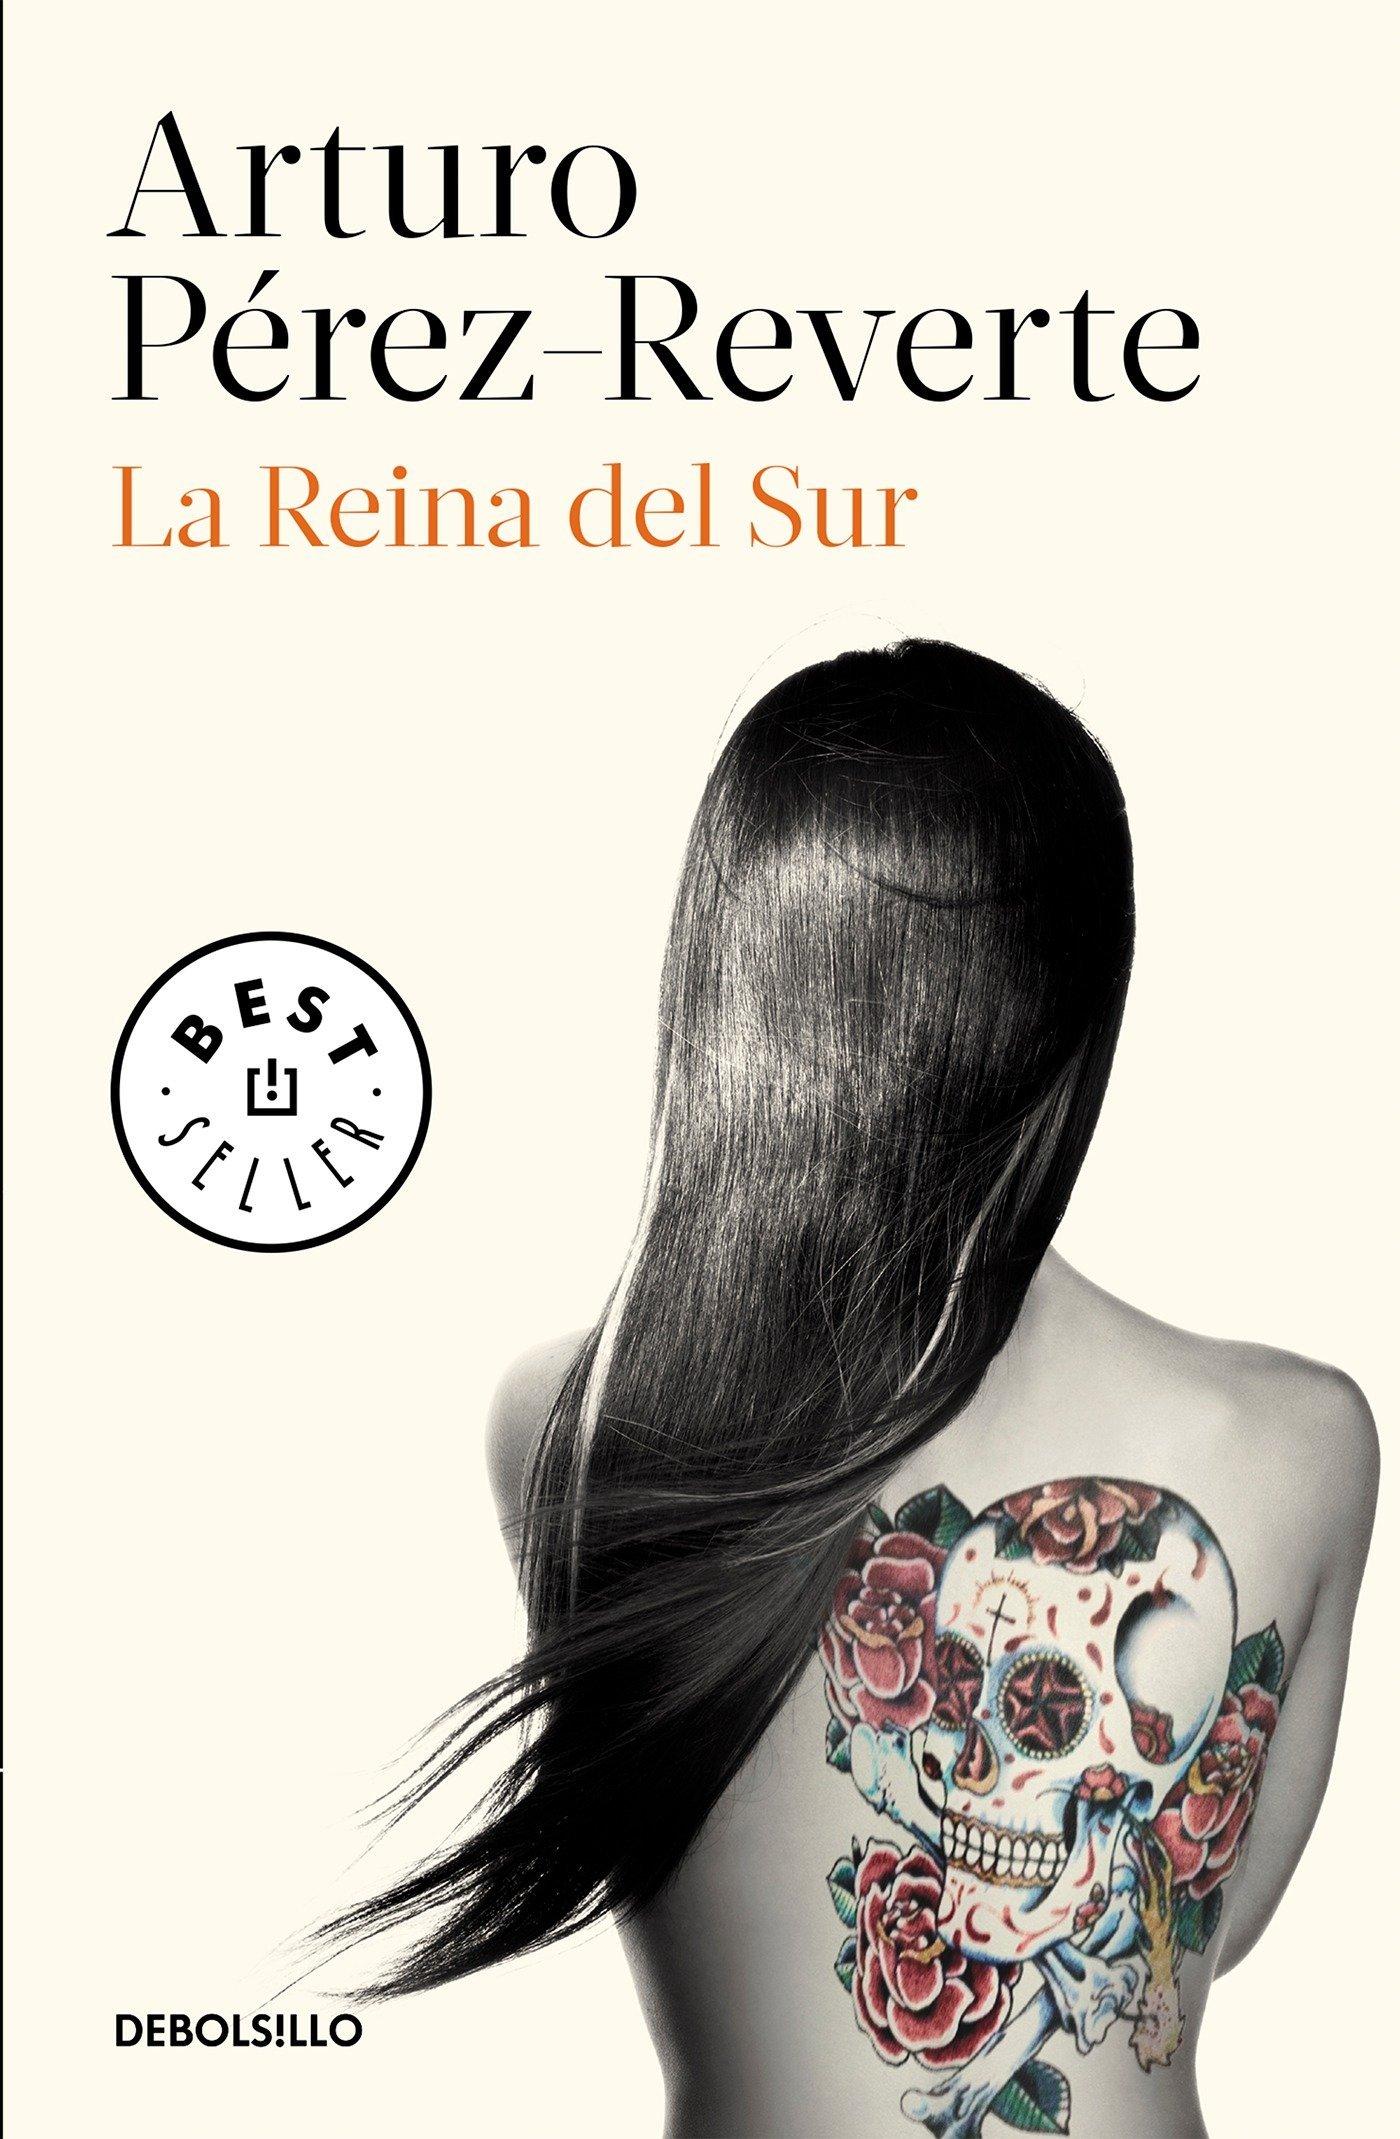 La Reina del Sur / The Queen of the South (Spanish Edition) by Debolsillo